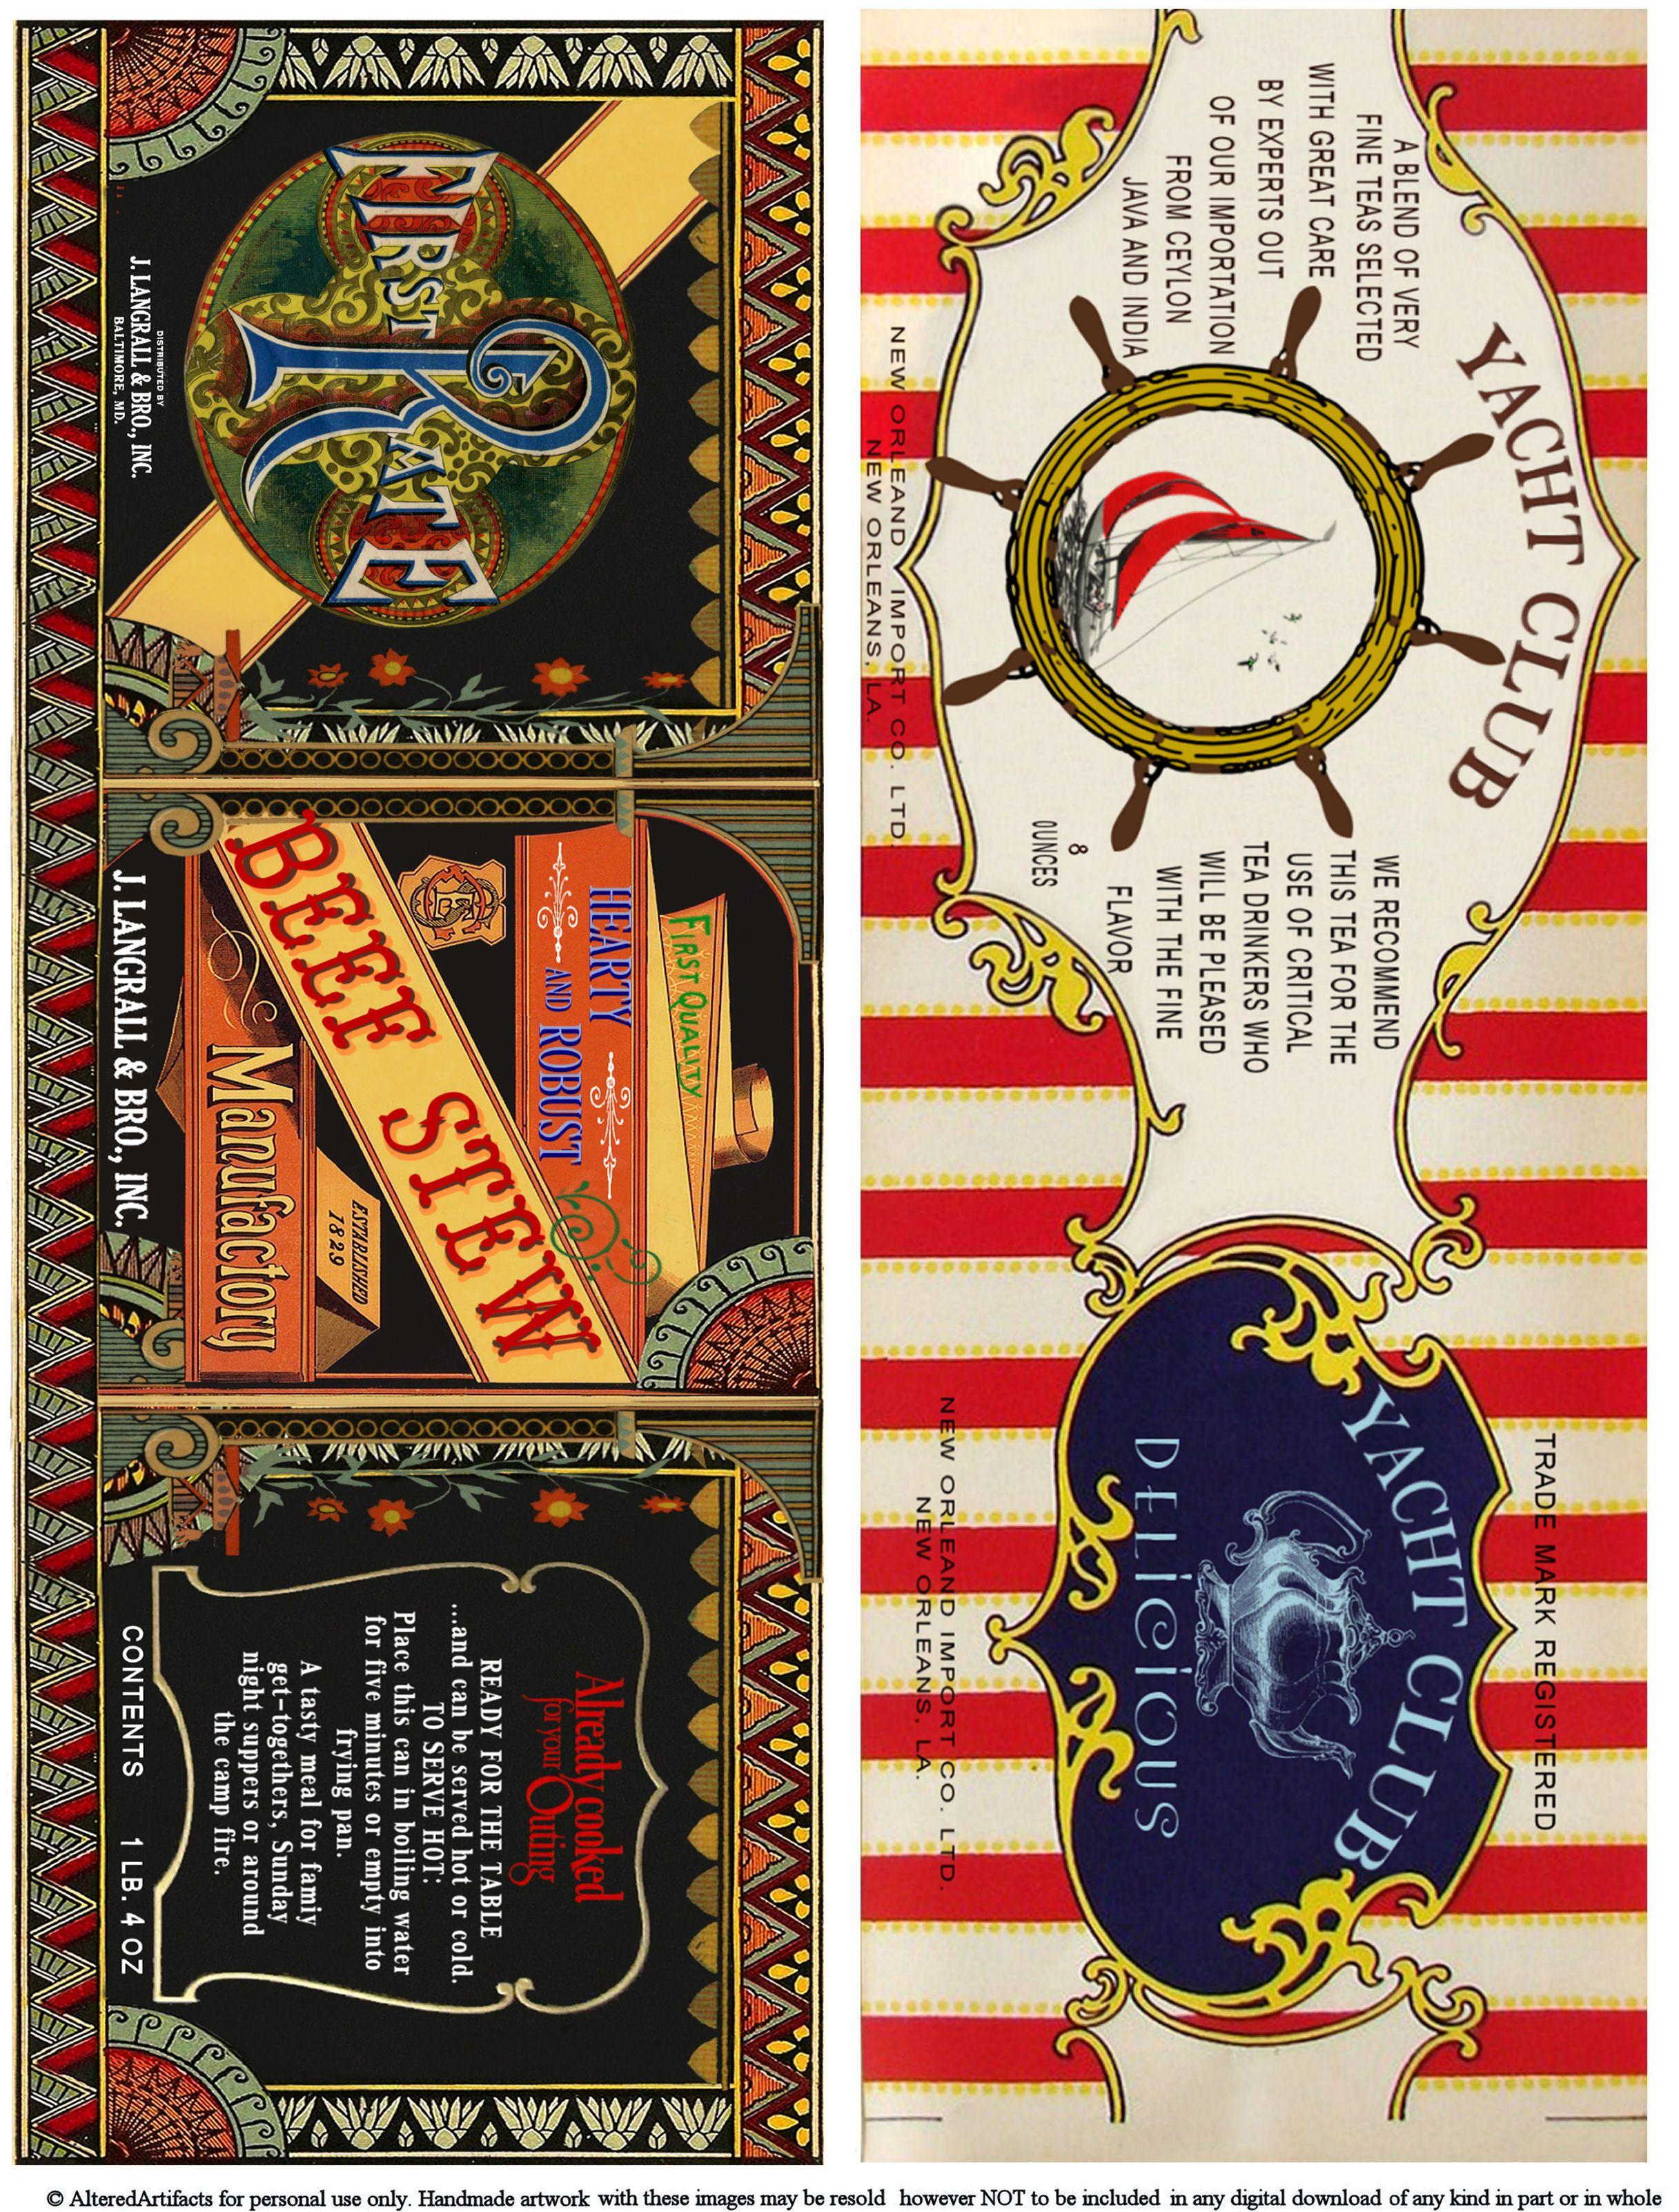 Free Printable Can Labels Vintage Brands Images For